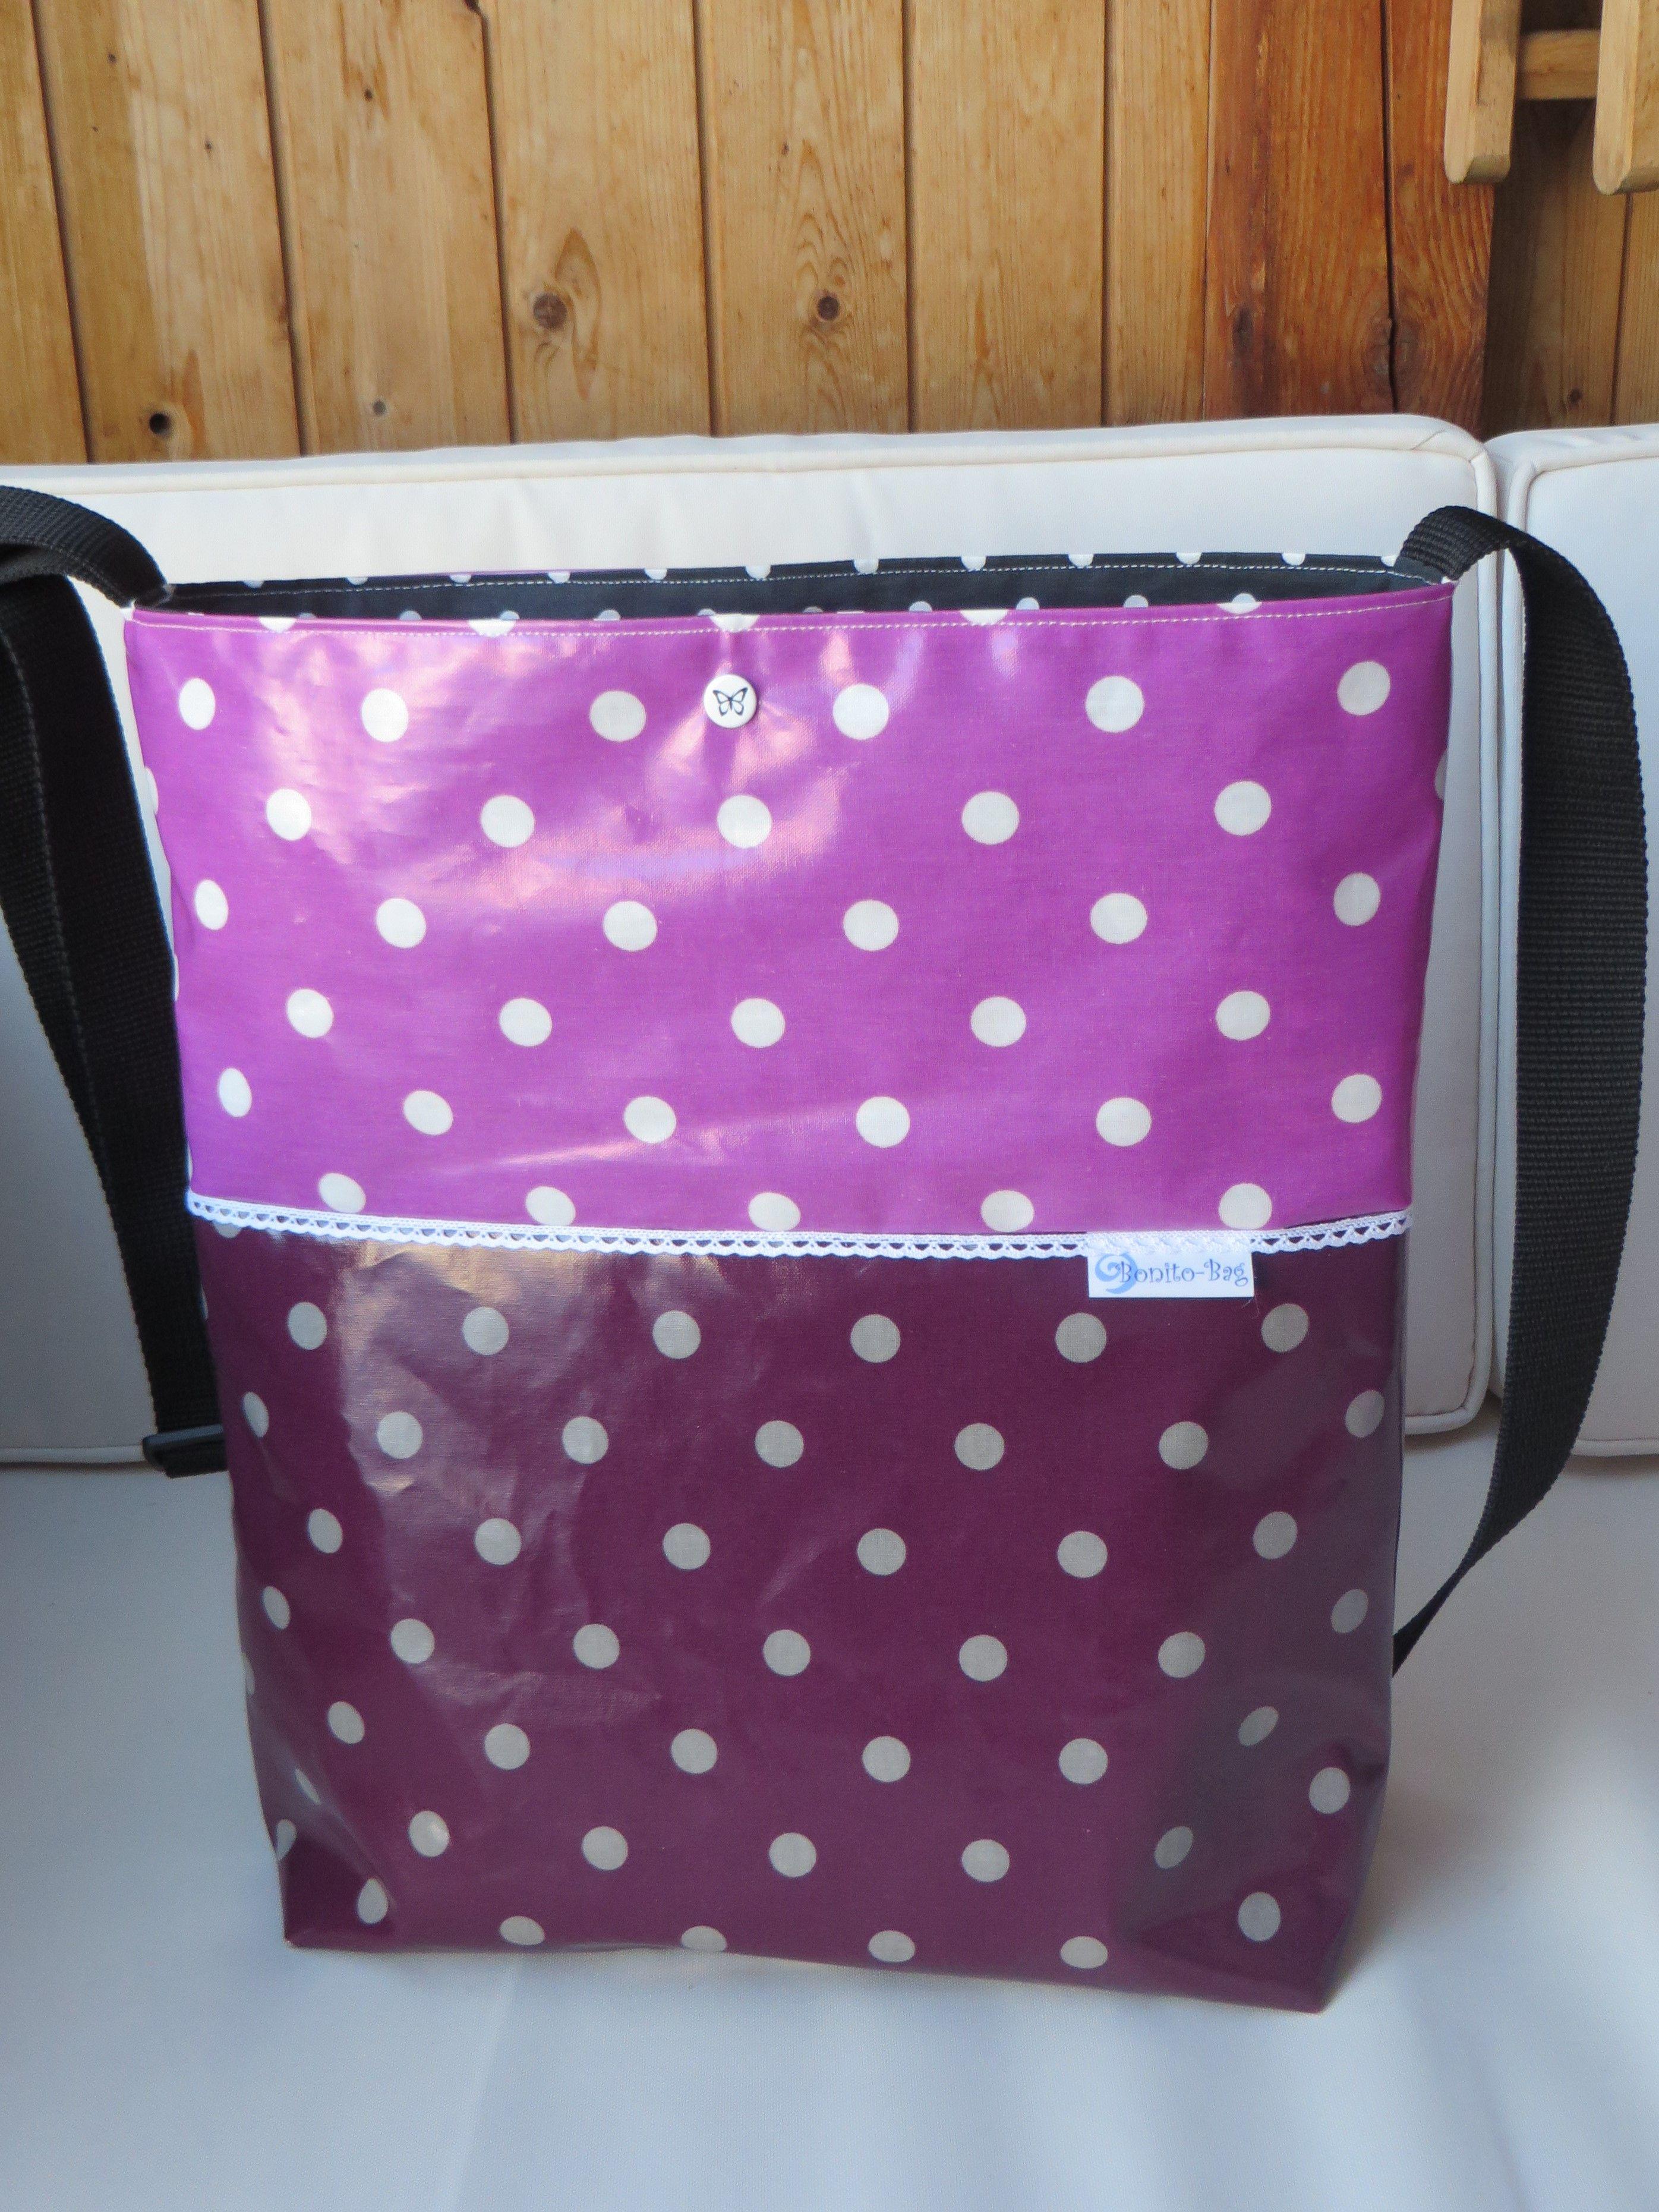 shopper tasche aus wachstuch n hen wachstuch taschen taschen n hen und wachstuch. Black Bedroom Furniture Sets. Home Design Ideas